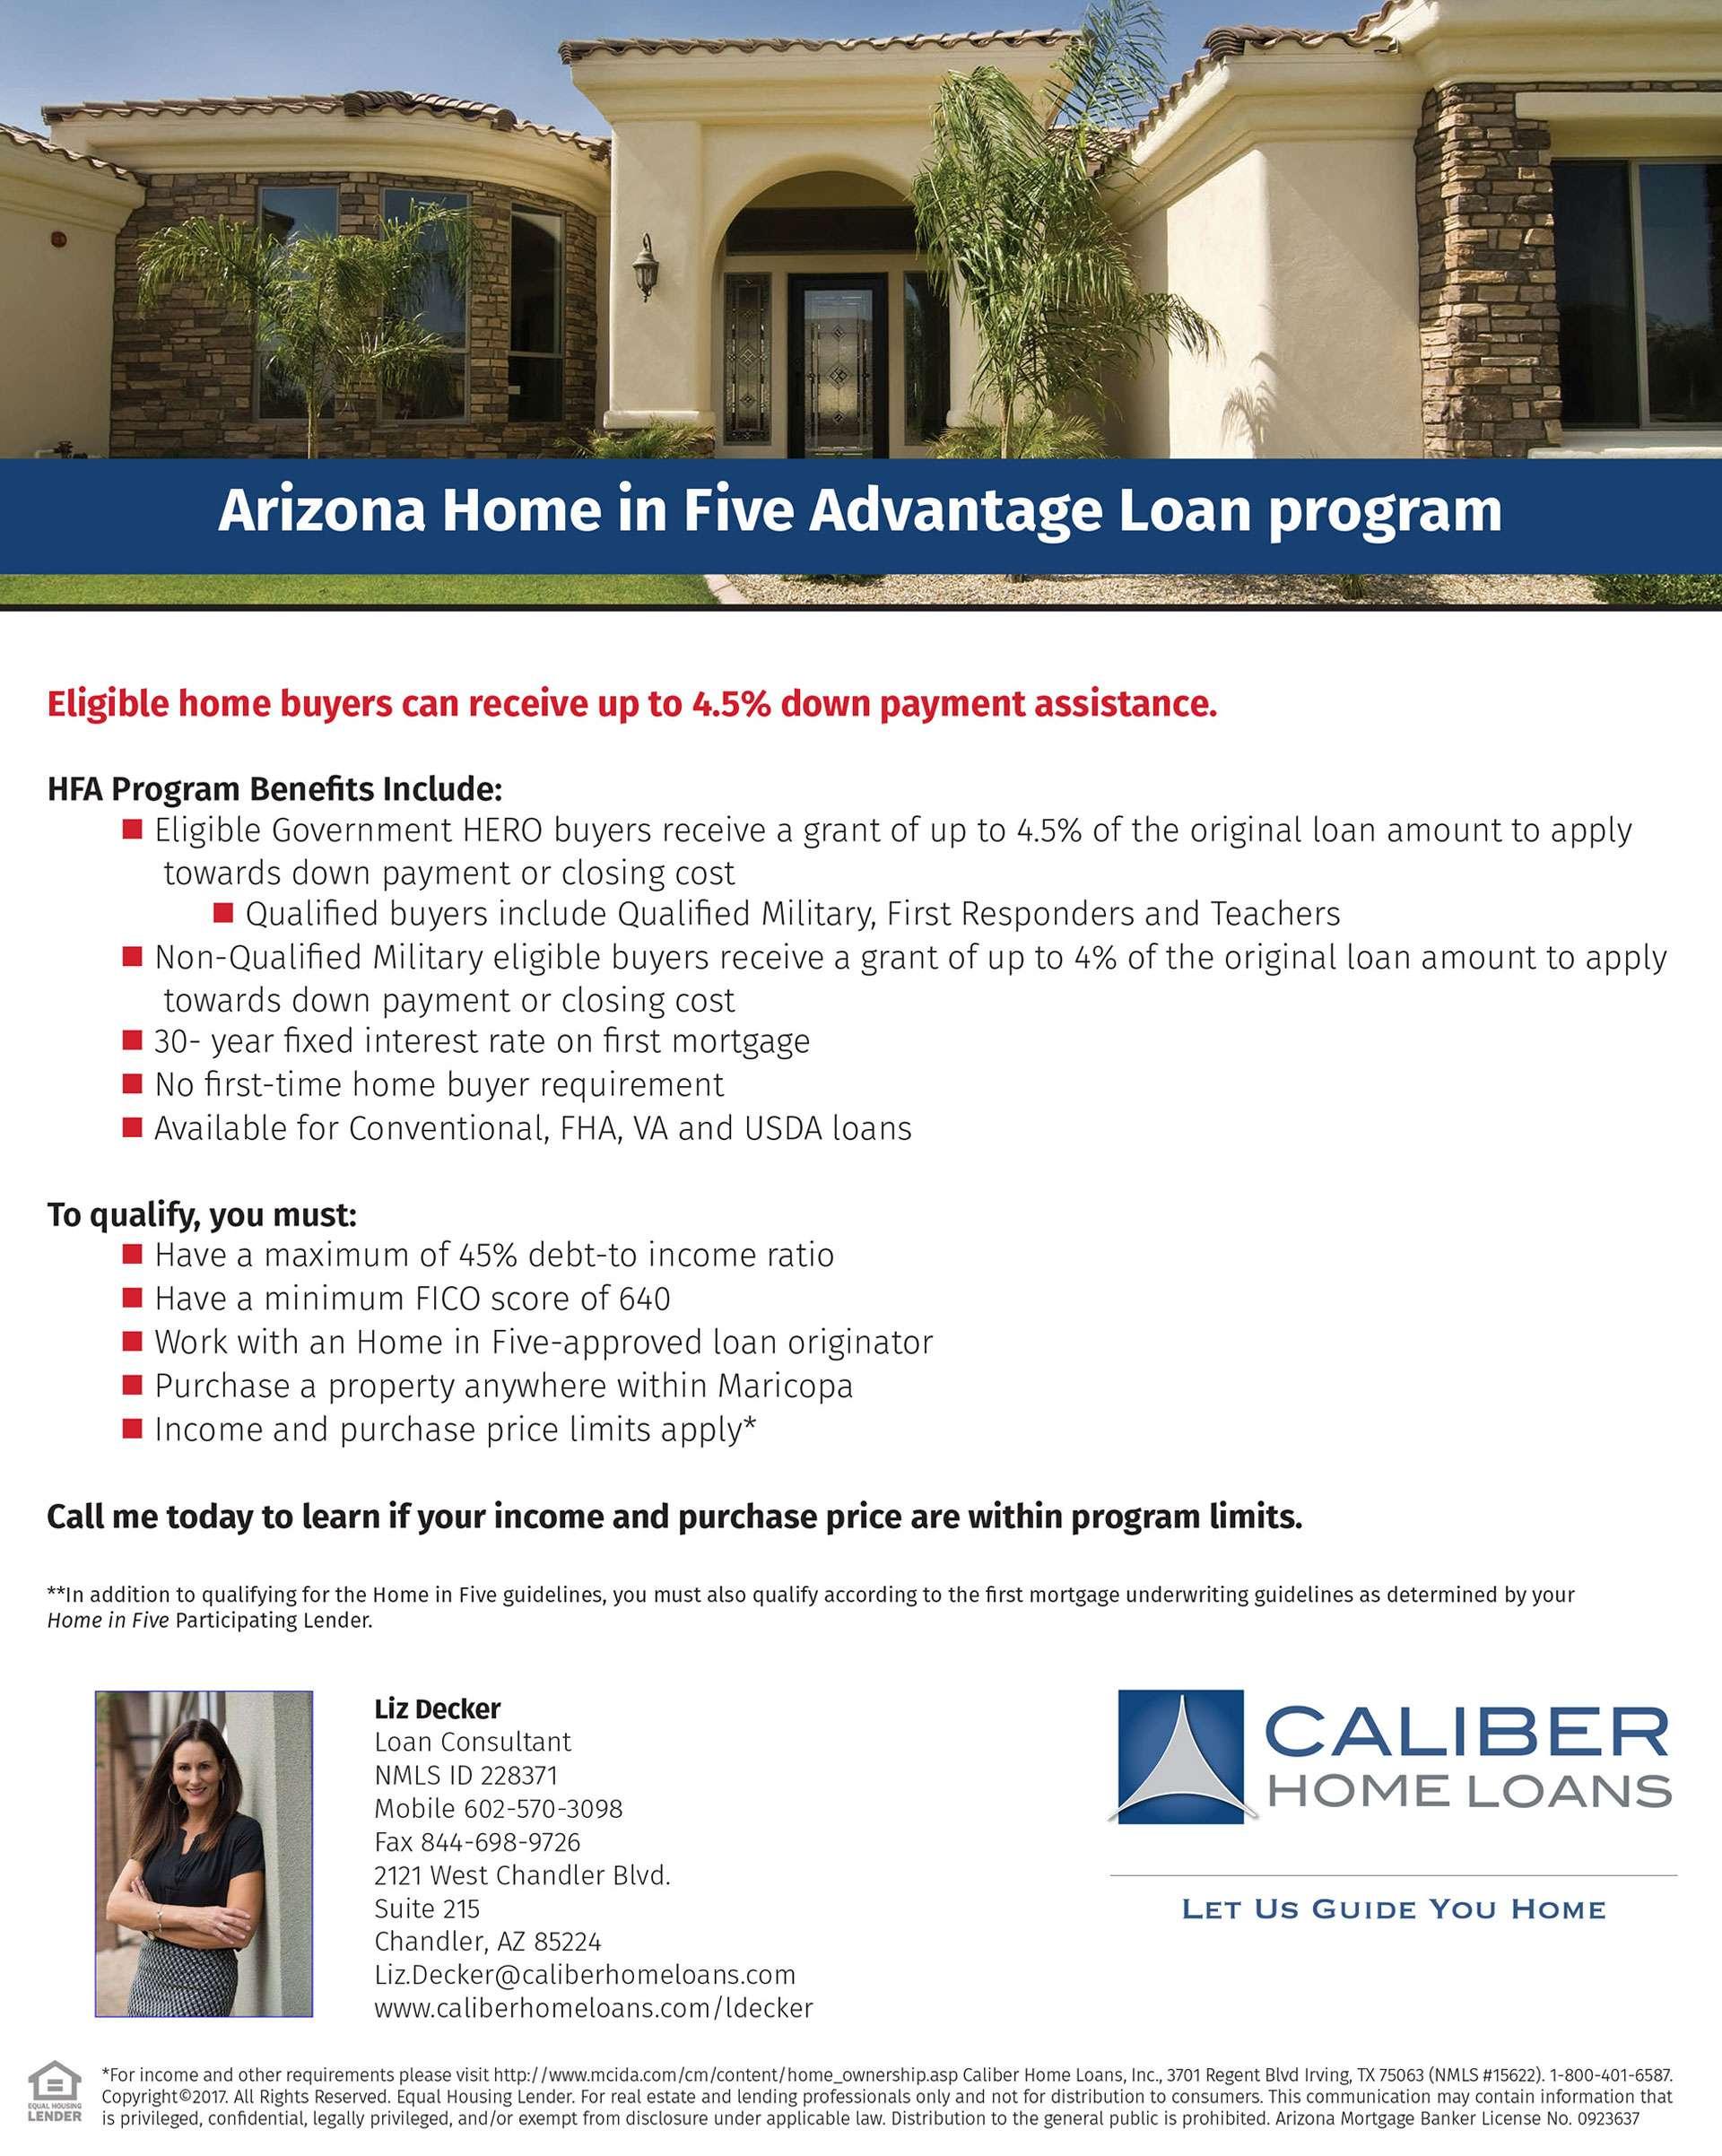 Arizona Home in Five Advantage Loan Program